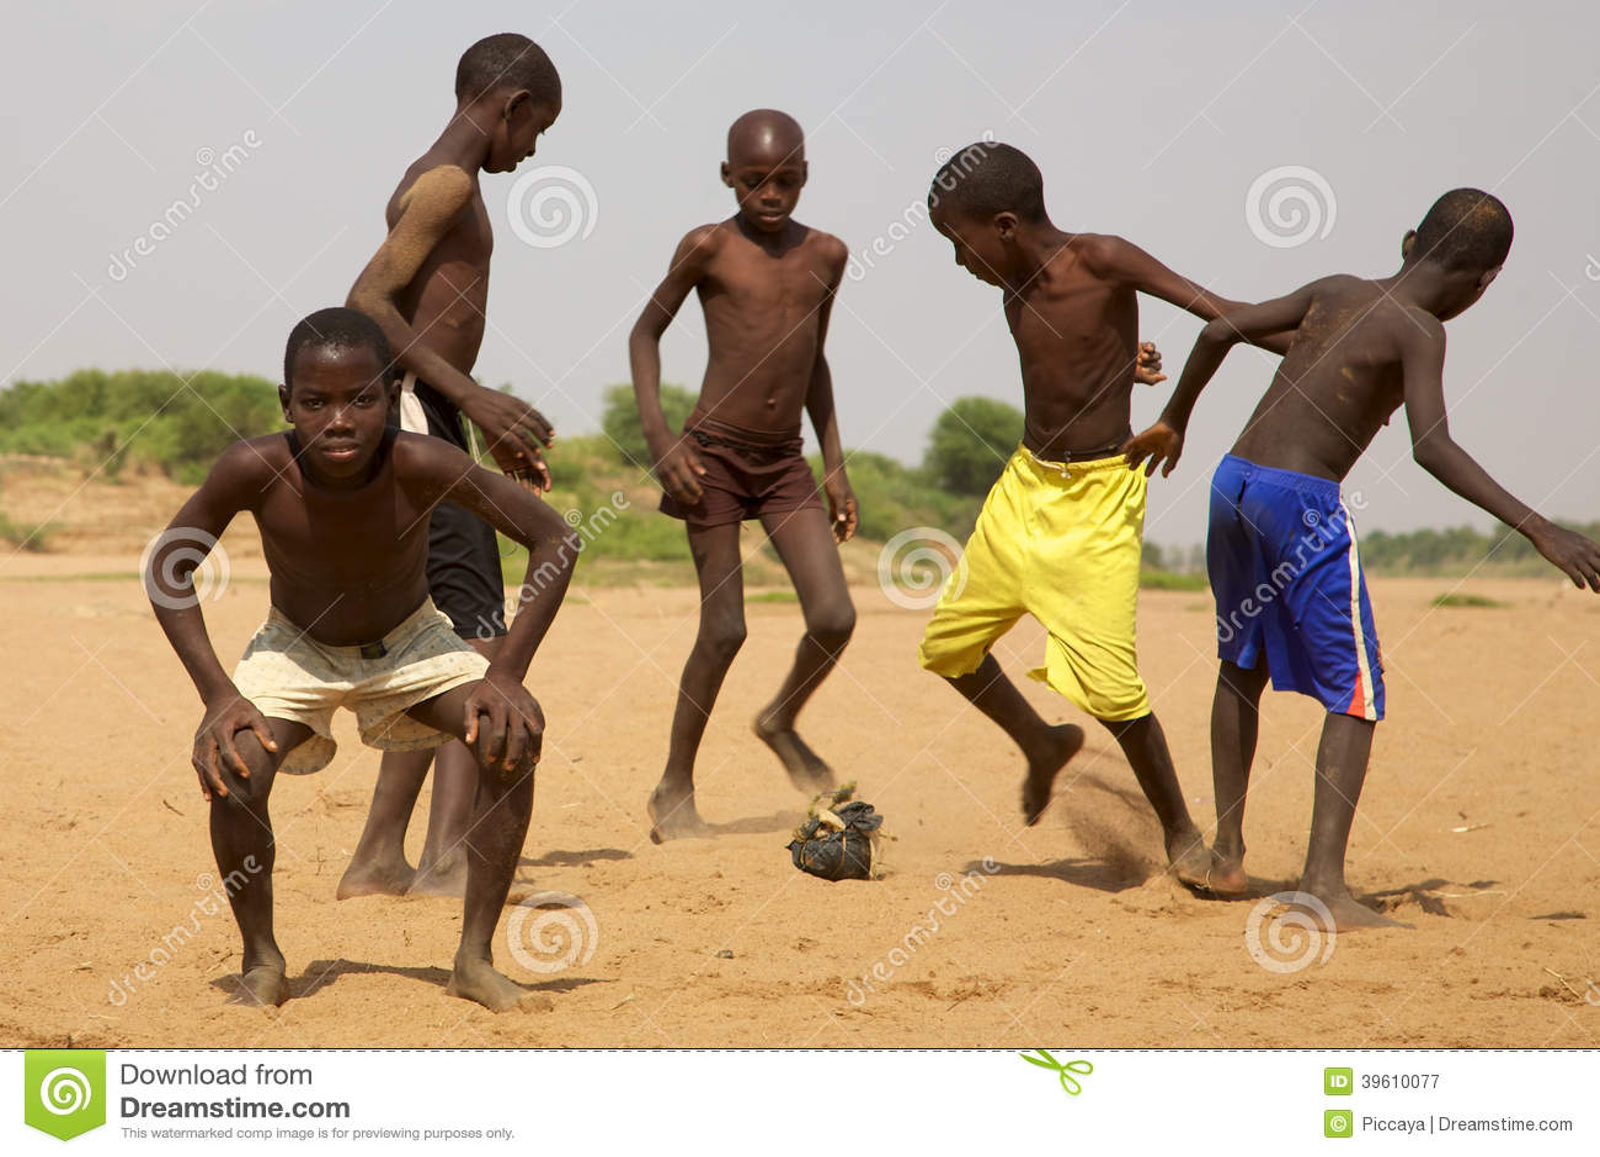 Kids playing soccer in Saint Louis